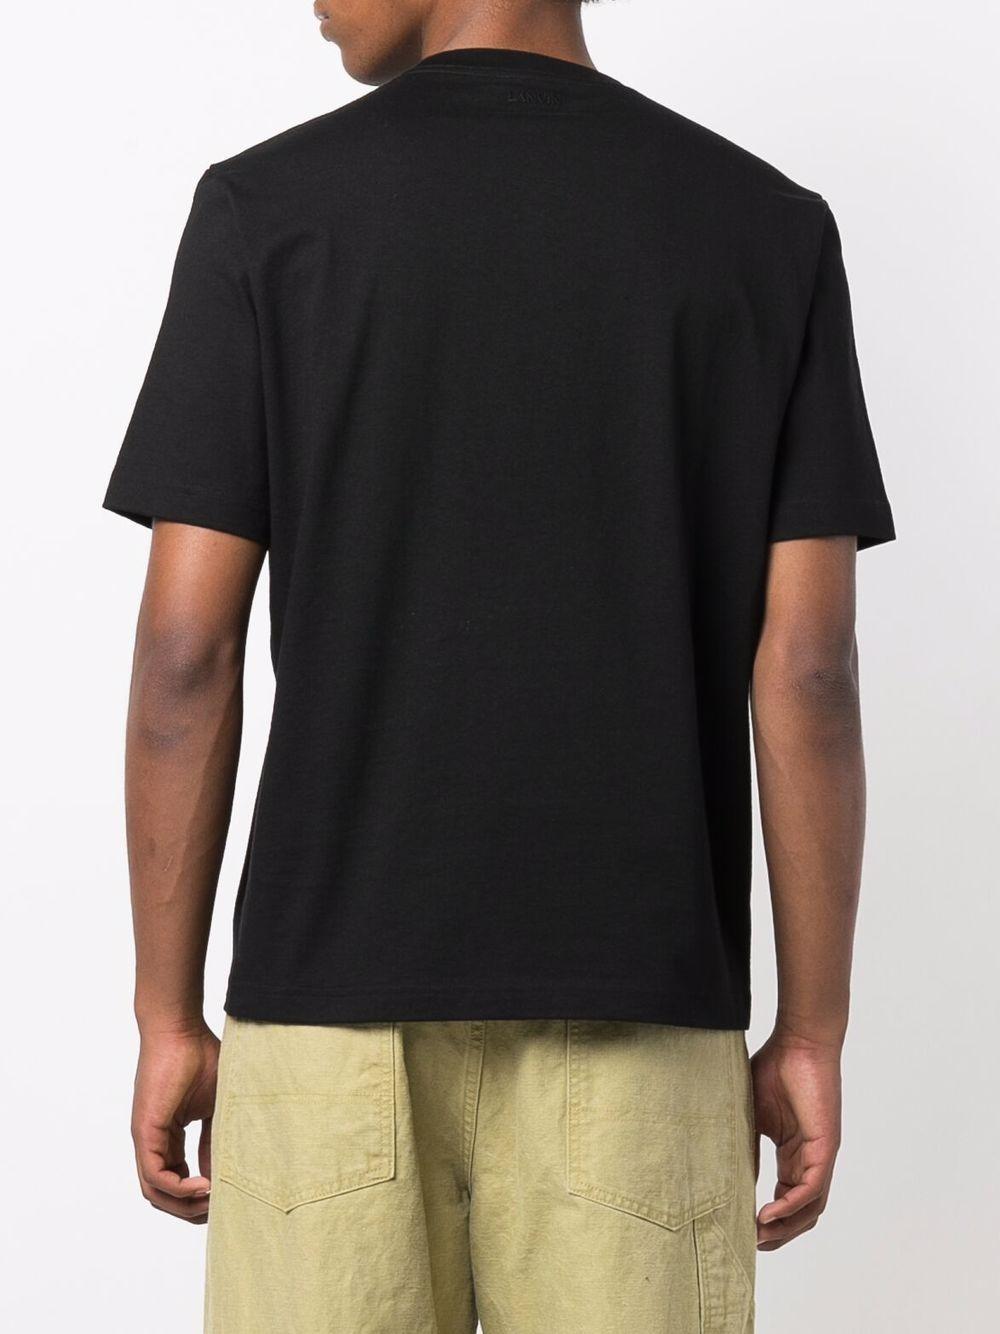 pocket t-shirt man black in cotton LANVIN | T-shirts | RM-TS0021-J028-A2110